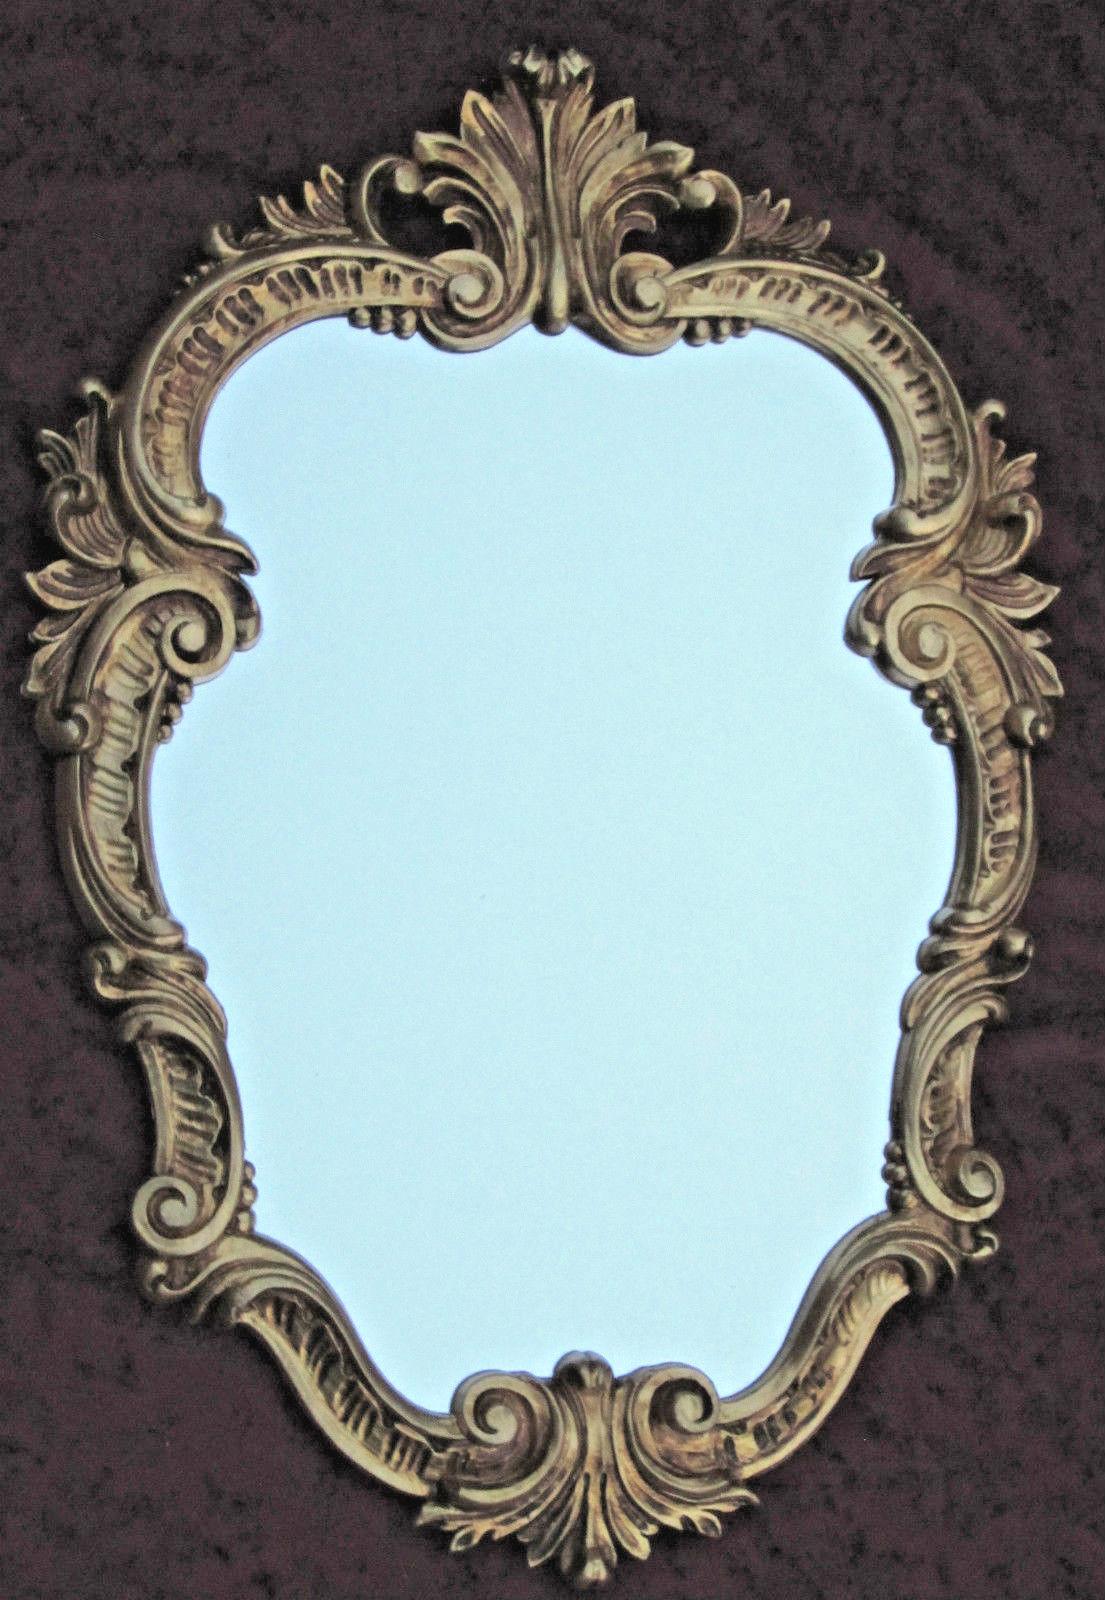 Wandspiegel Antik Gold Oval Vintage Badspiegel Barock Shabby 49x33